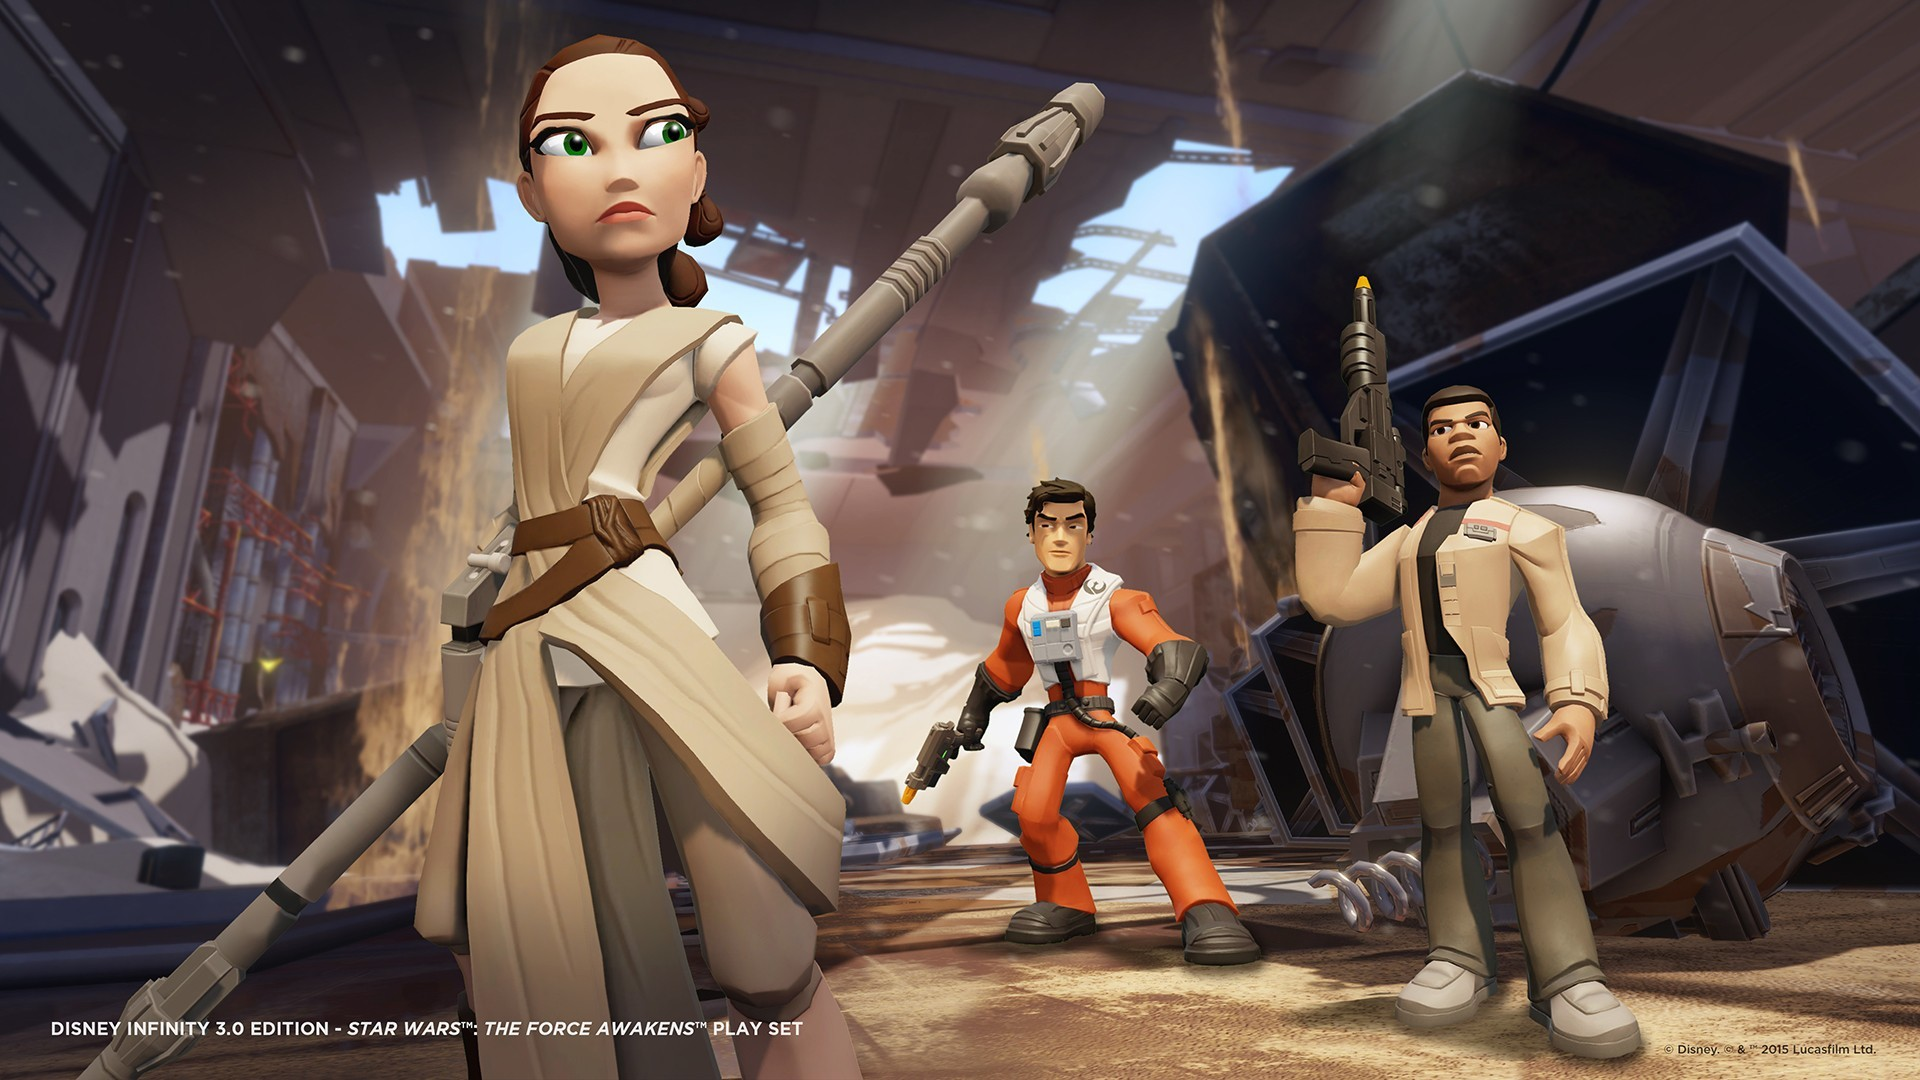 … Disney Infinity – Star Wars: The Force Awakens Play Set toy …